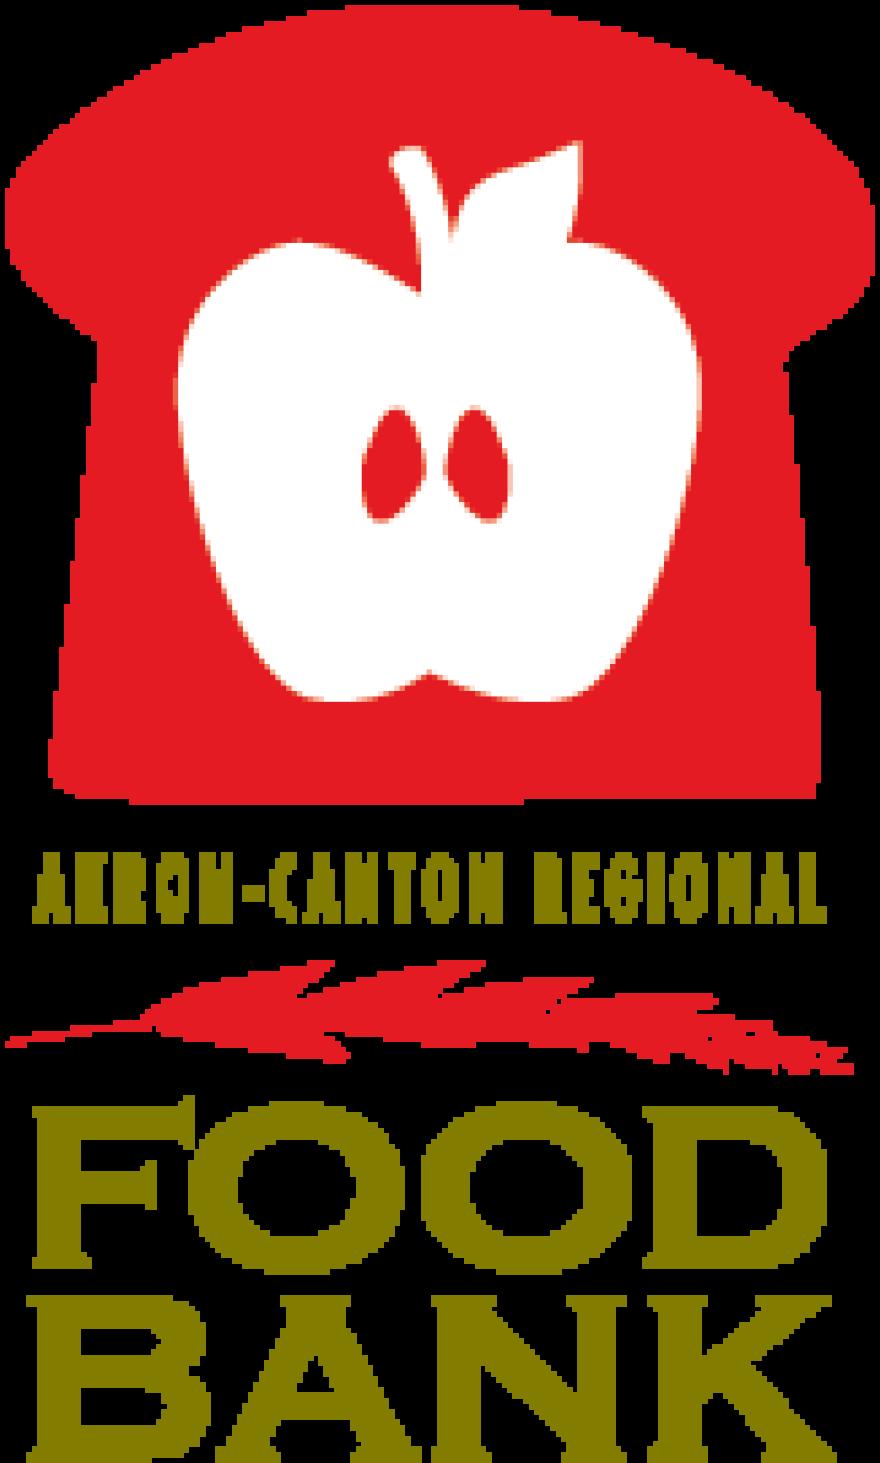 Akron-Canton Foodbank logo